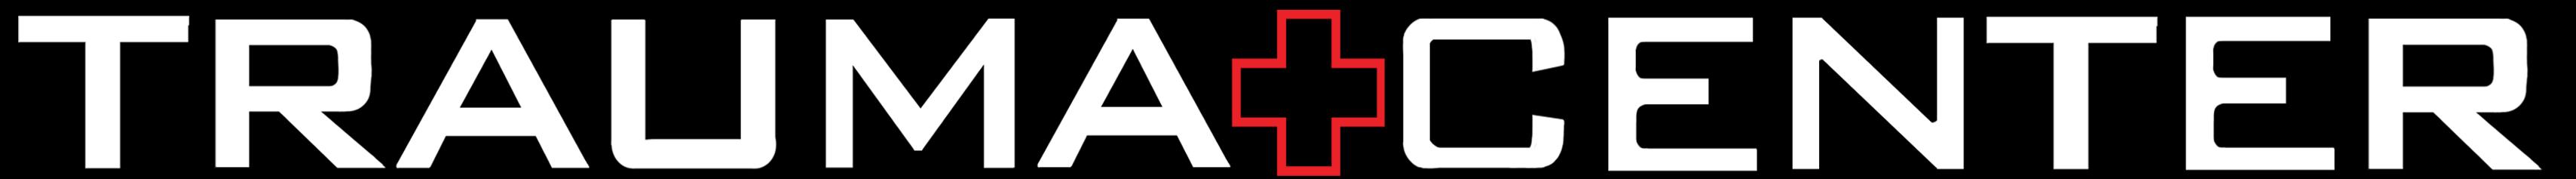 Delphi Developer Cover Letter Instrumentation Design Engineer